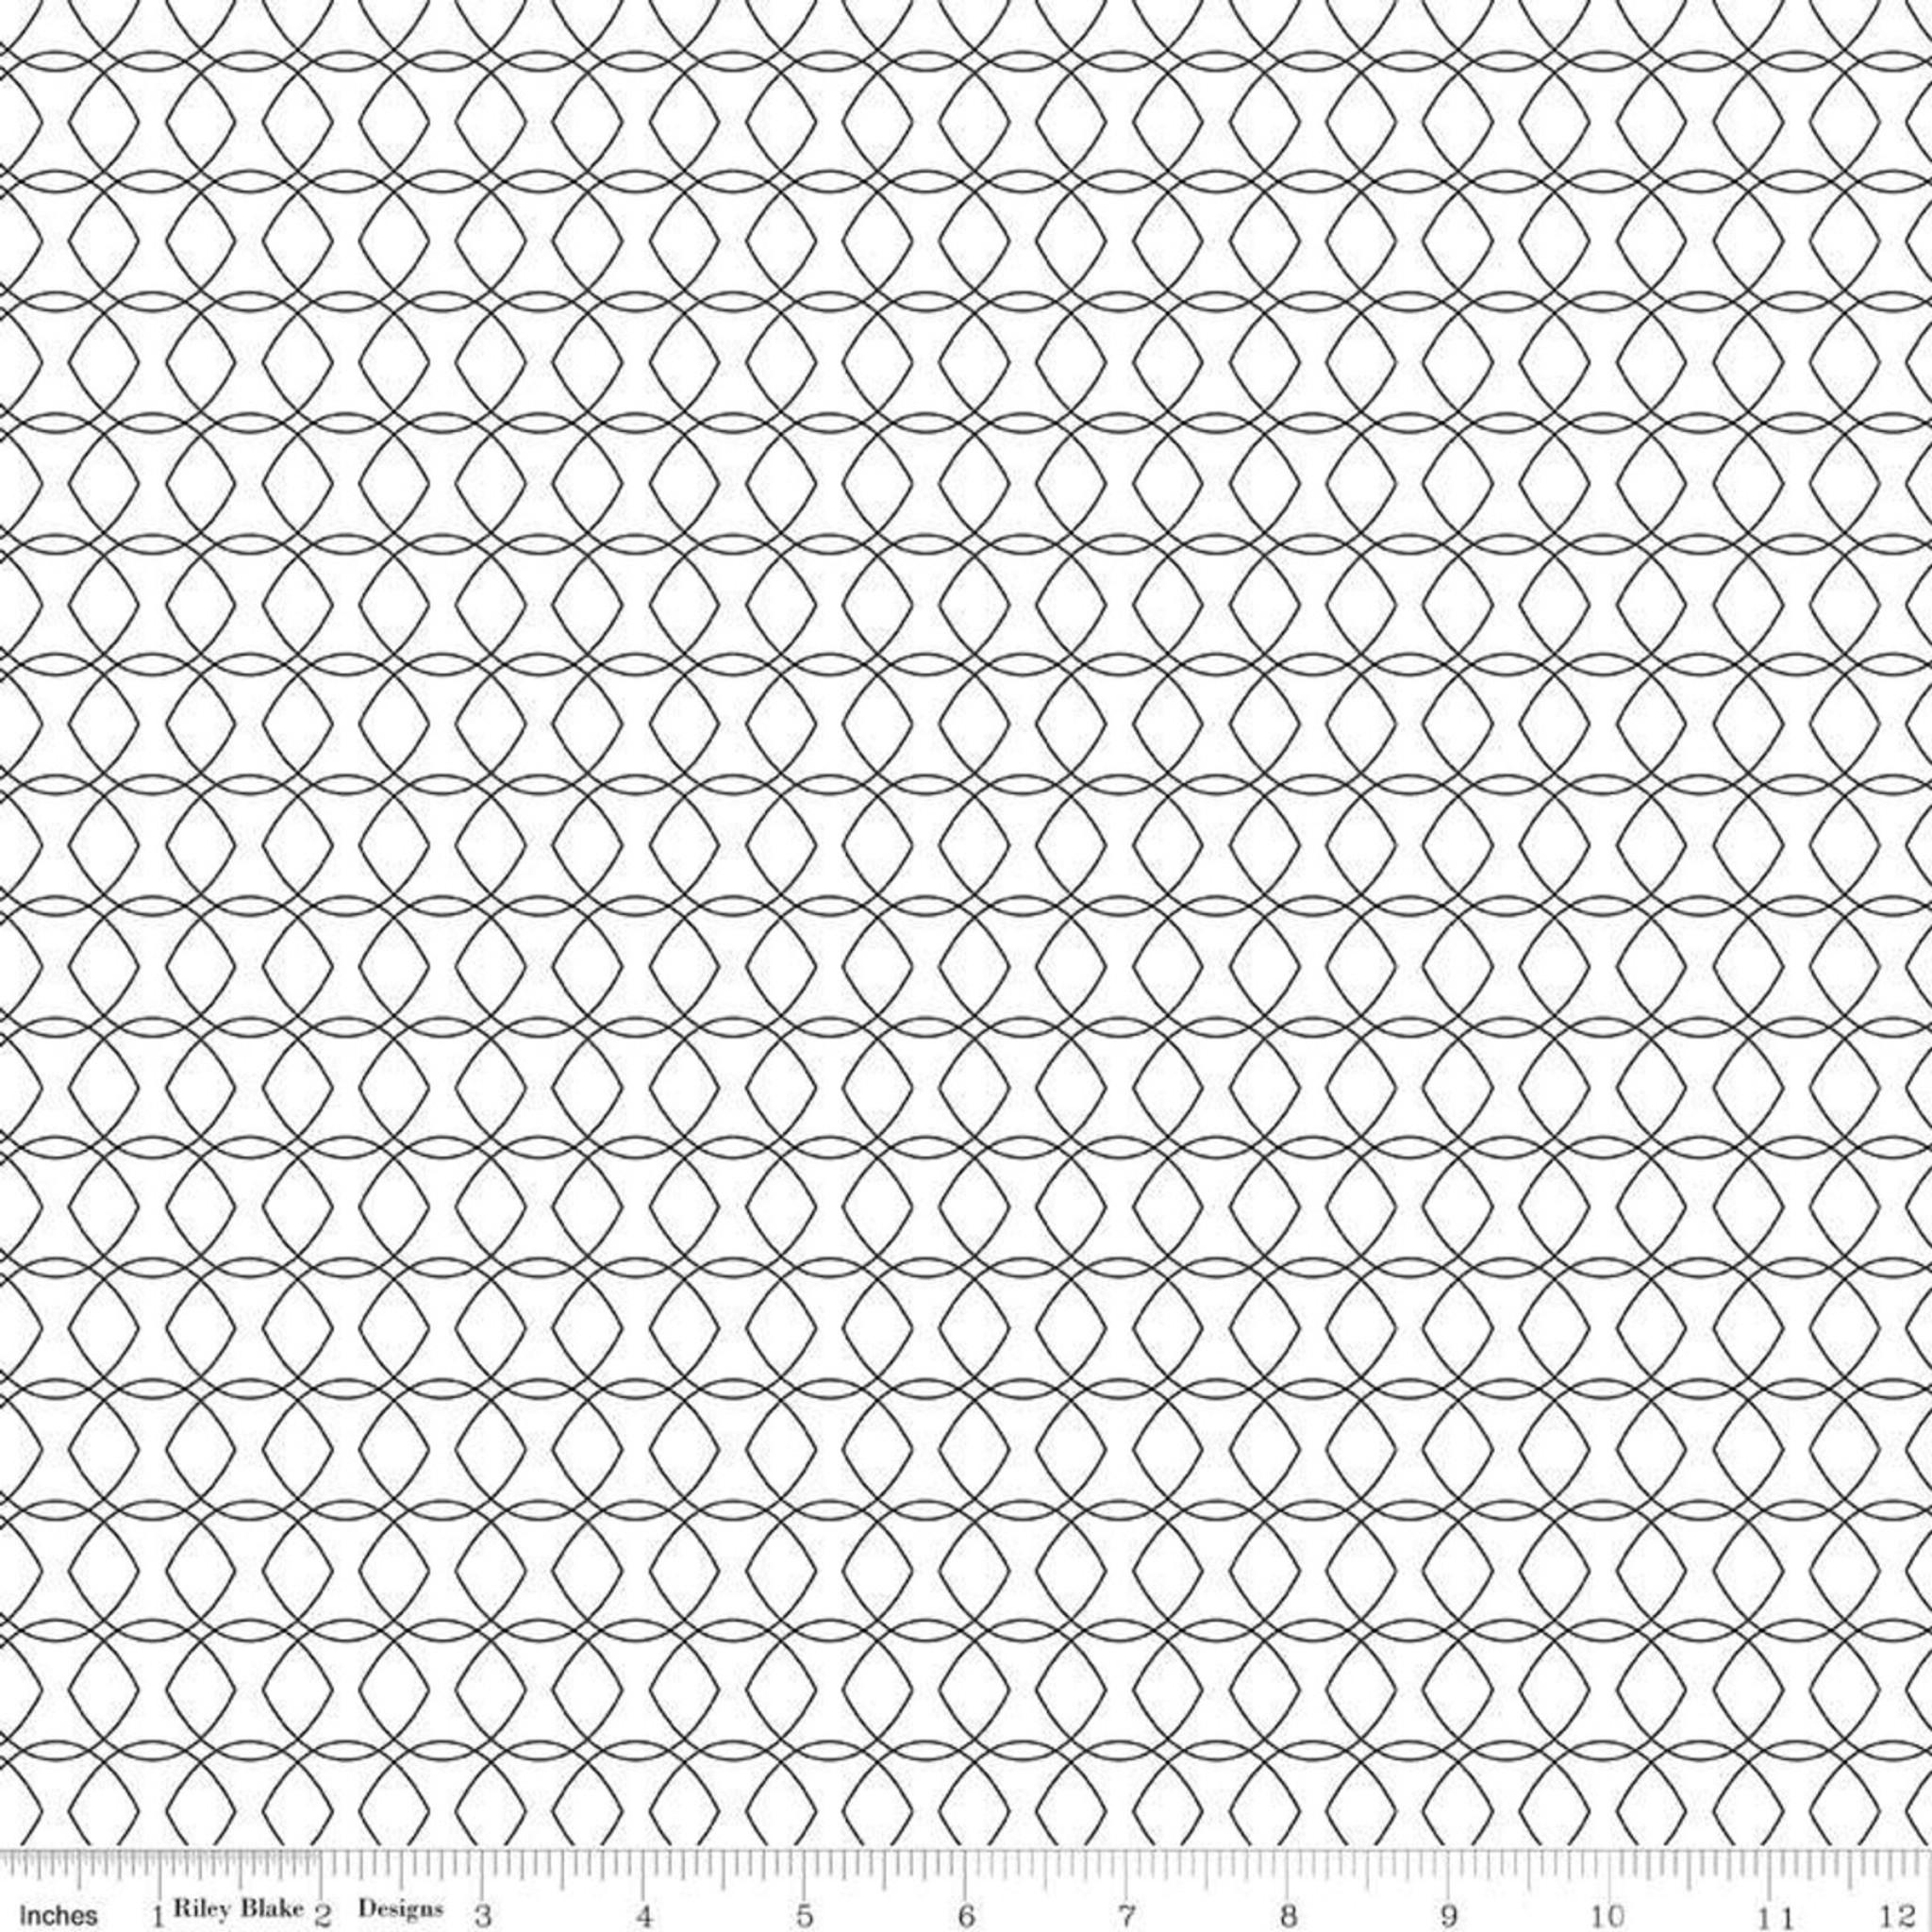 42 Count 10 x 10 Juniper~ Black,White,Grey 10 Stacker Precut by Jen Allyson for Riley Blake Designs #10-8330-42~100/% Cotton